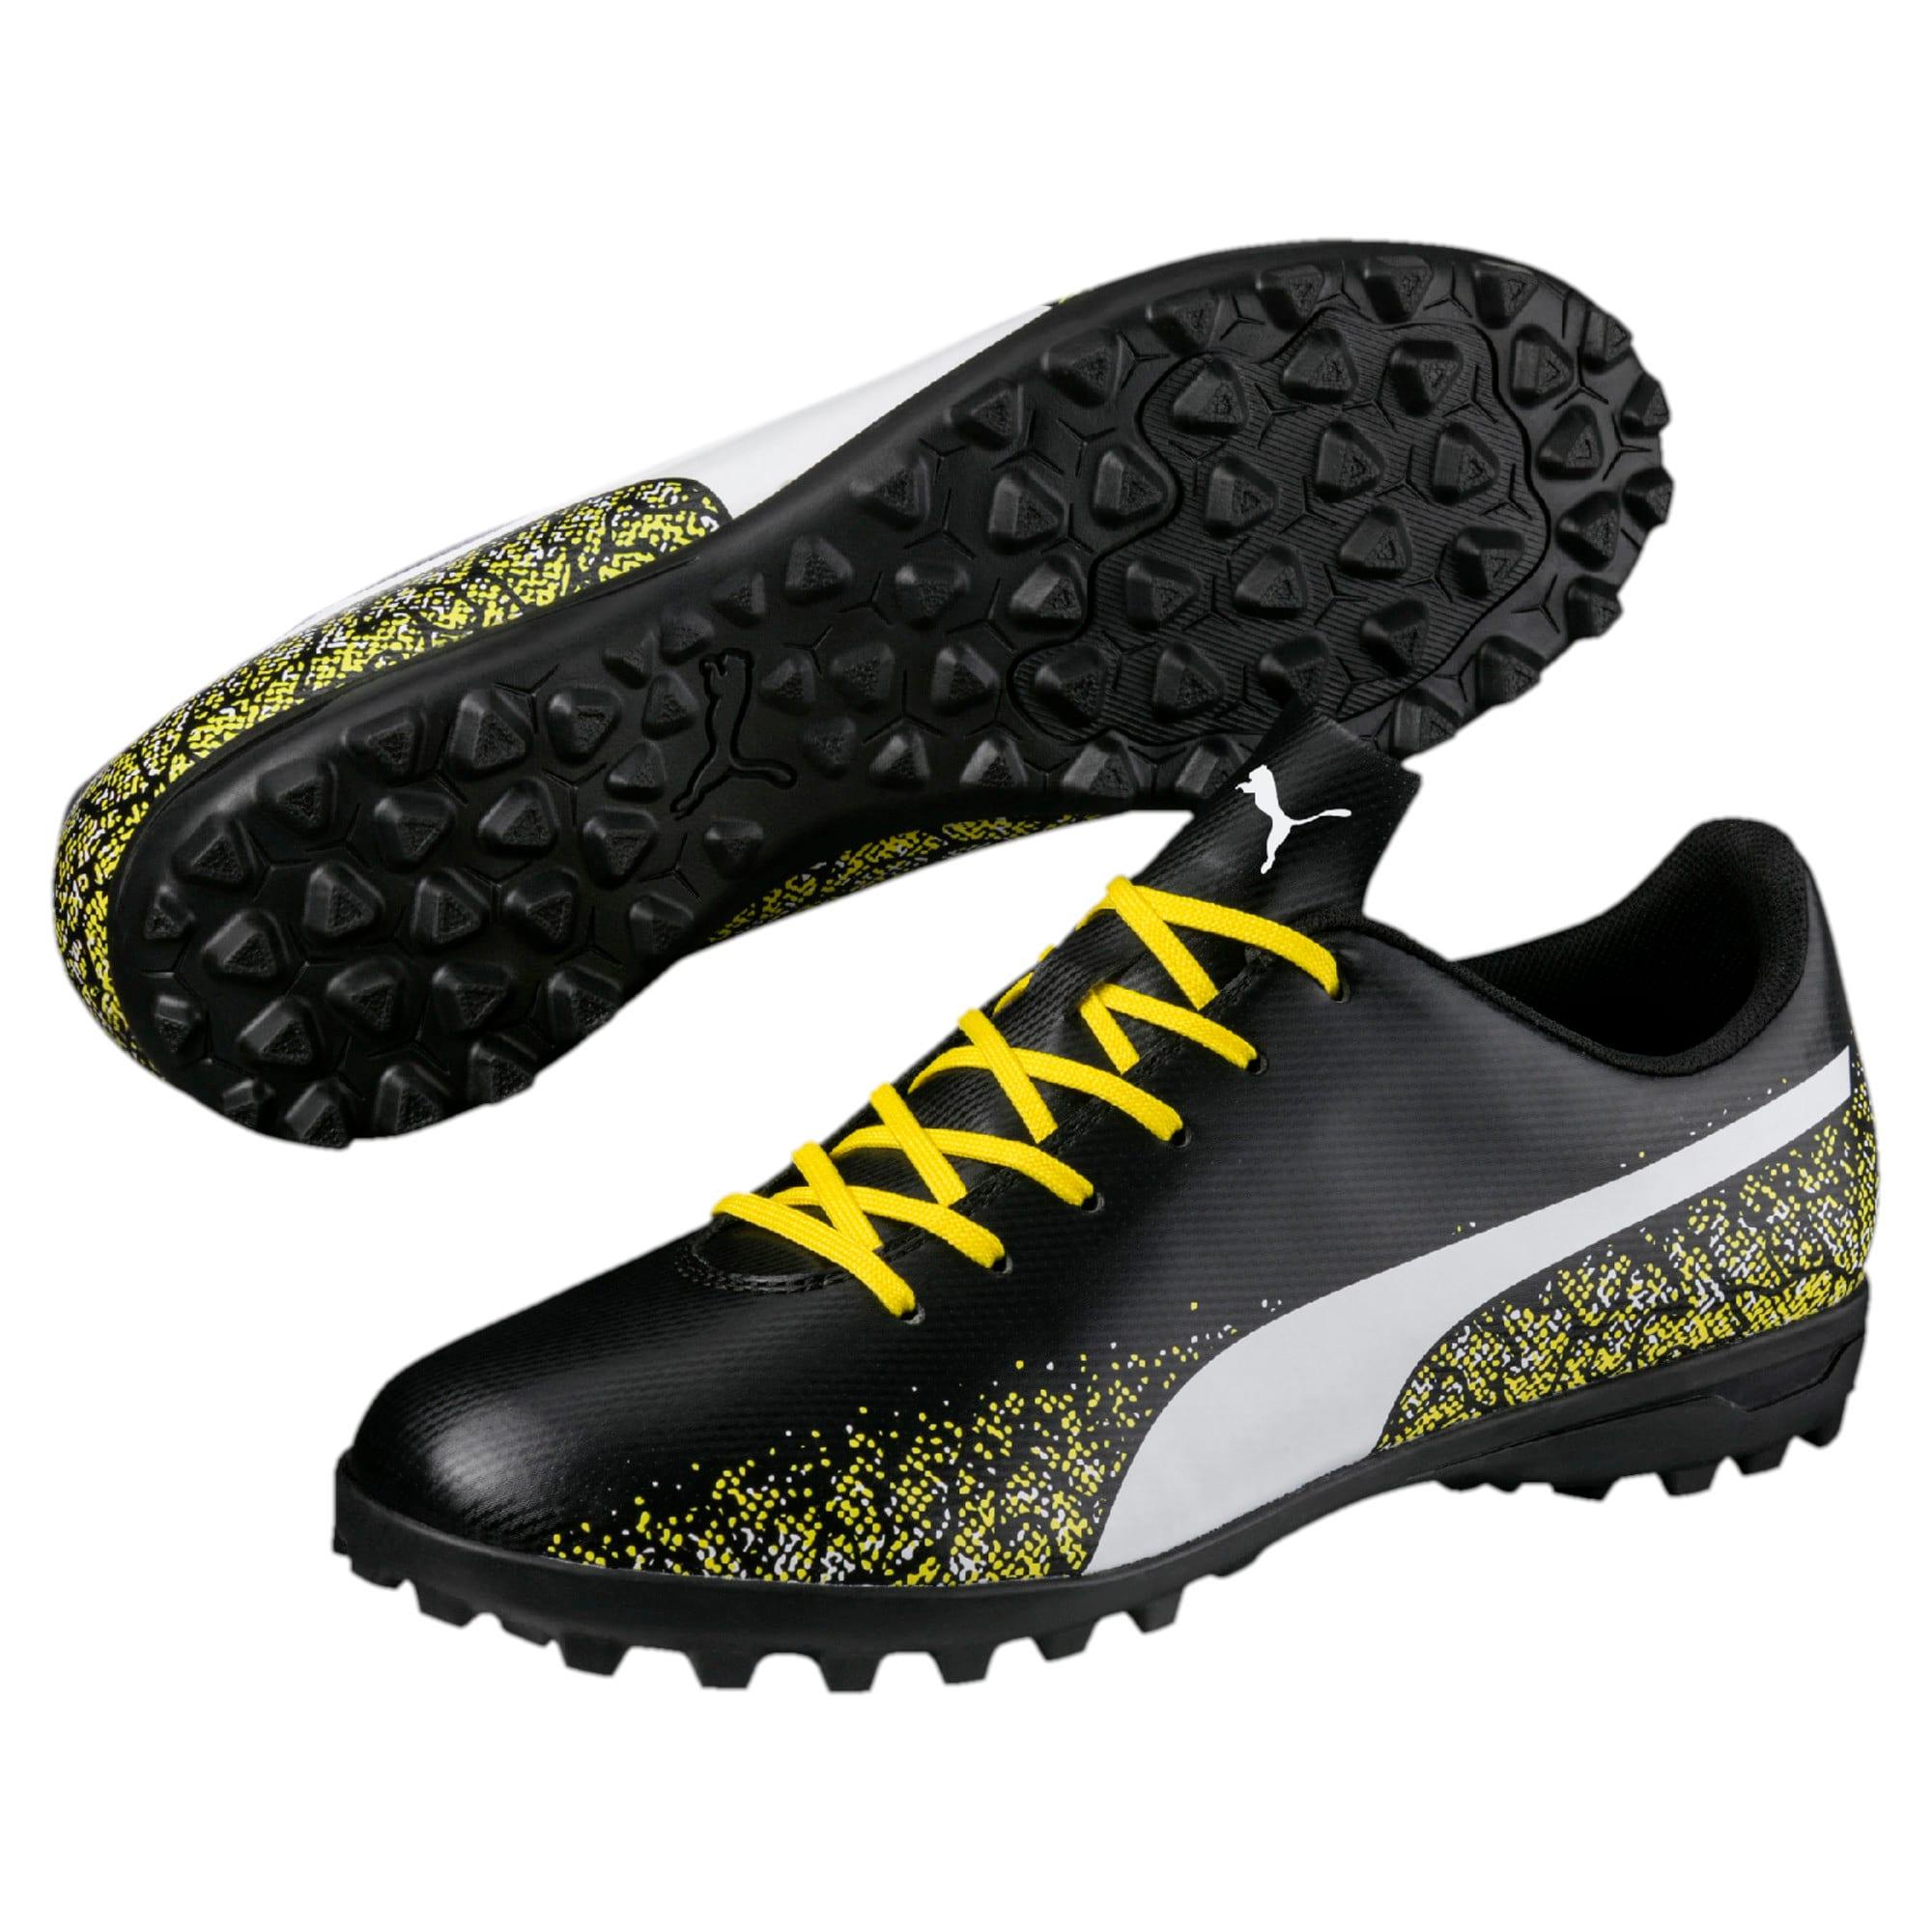 Thumbnail 6 of Truora TT Men's Football Boots, Black-White-Blazing Yellow, medium-IND